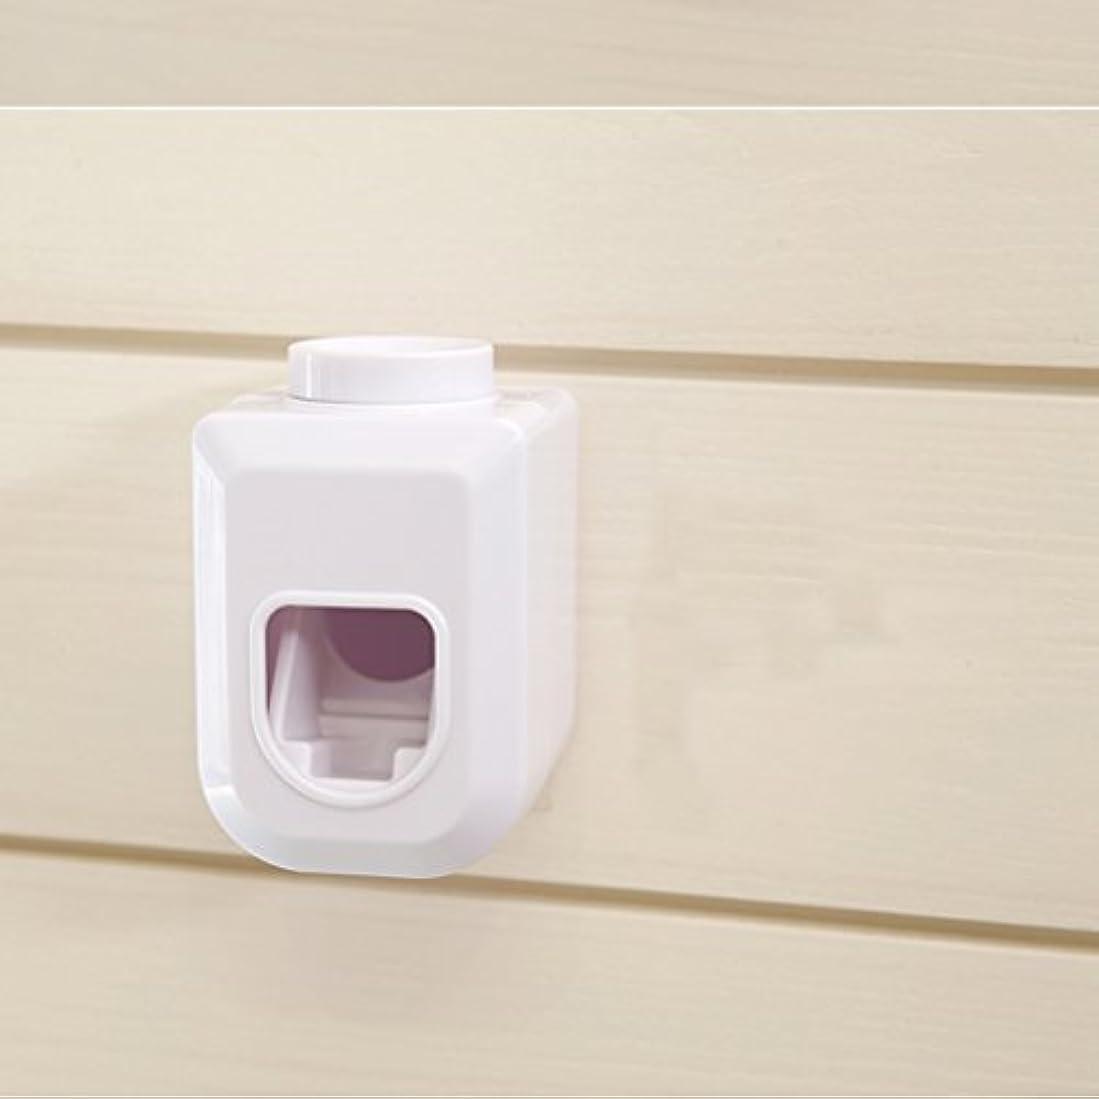 BESTOMZ ハンズフリー歯磨き粉スクイーザー, ウォールマウント自動防塵練り歯磨き粉ディスペンサー白